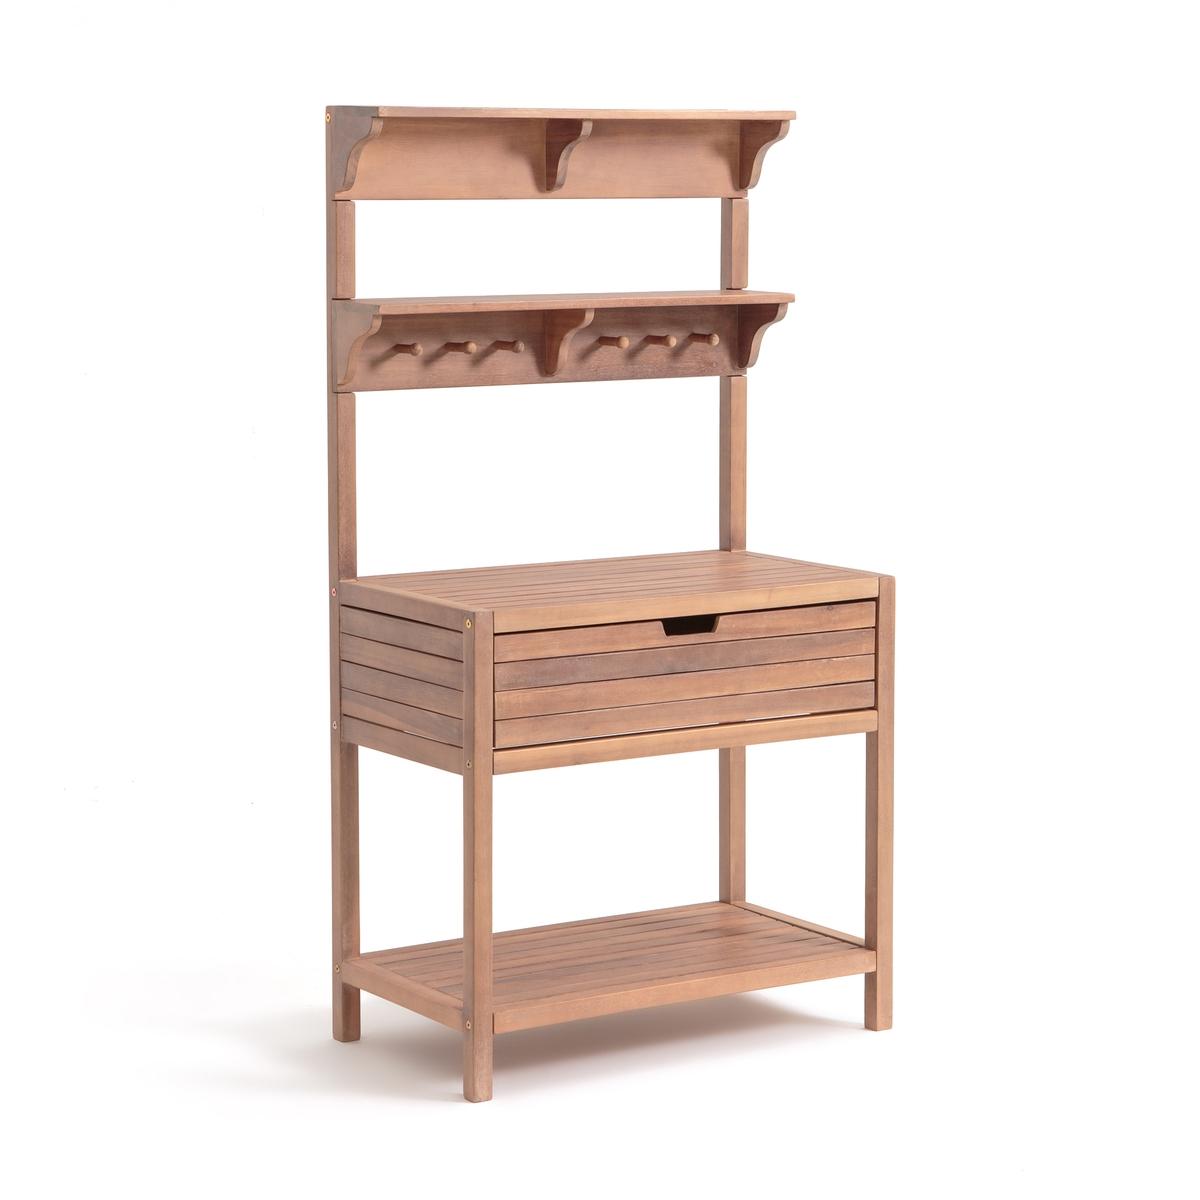 Стол для сада из акации FSC* CALEB стол для сада из акации fsc caleb